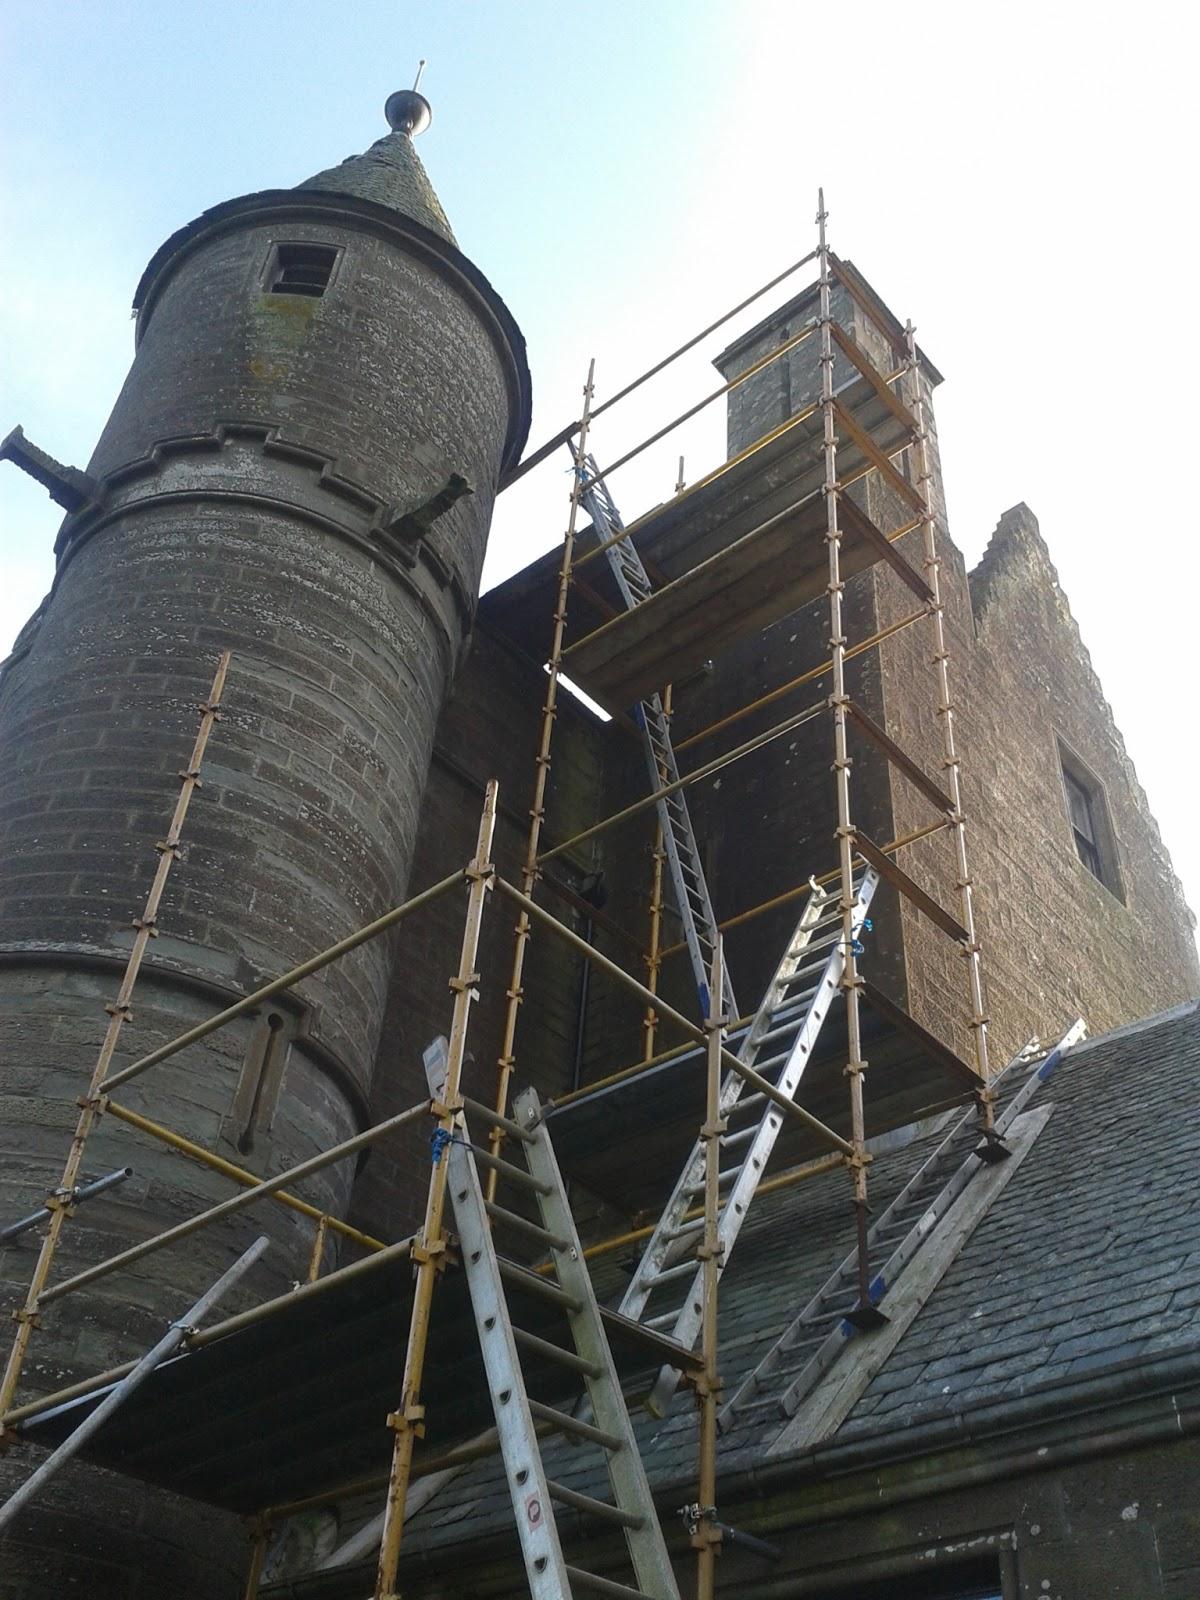 Balintore Castle Restoration Project July 2013